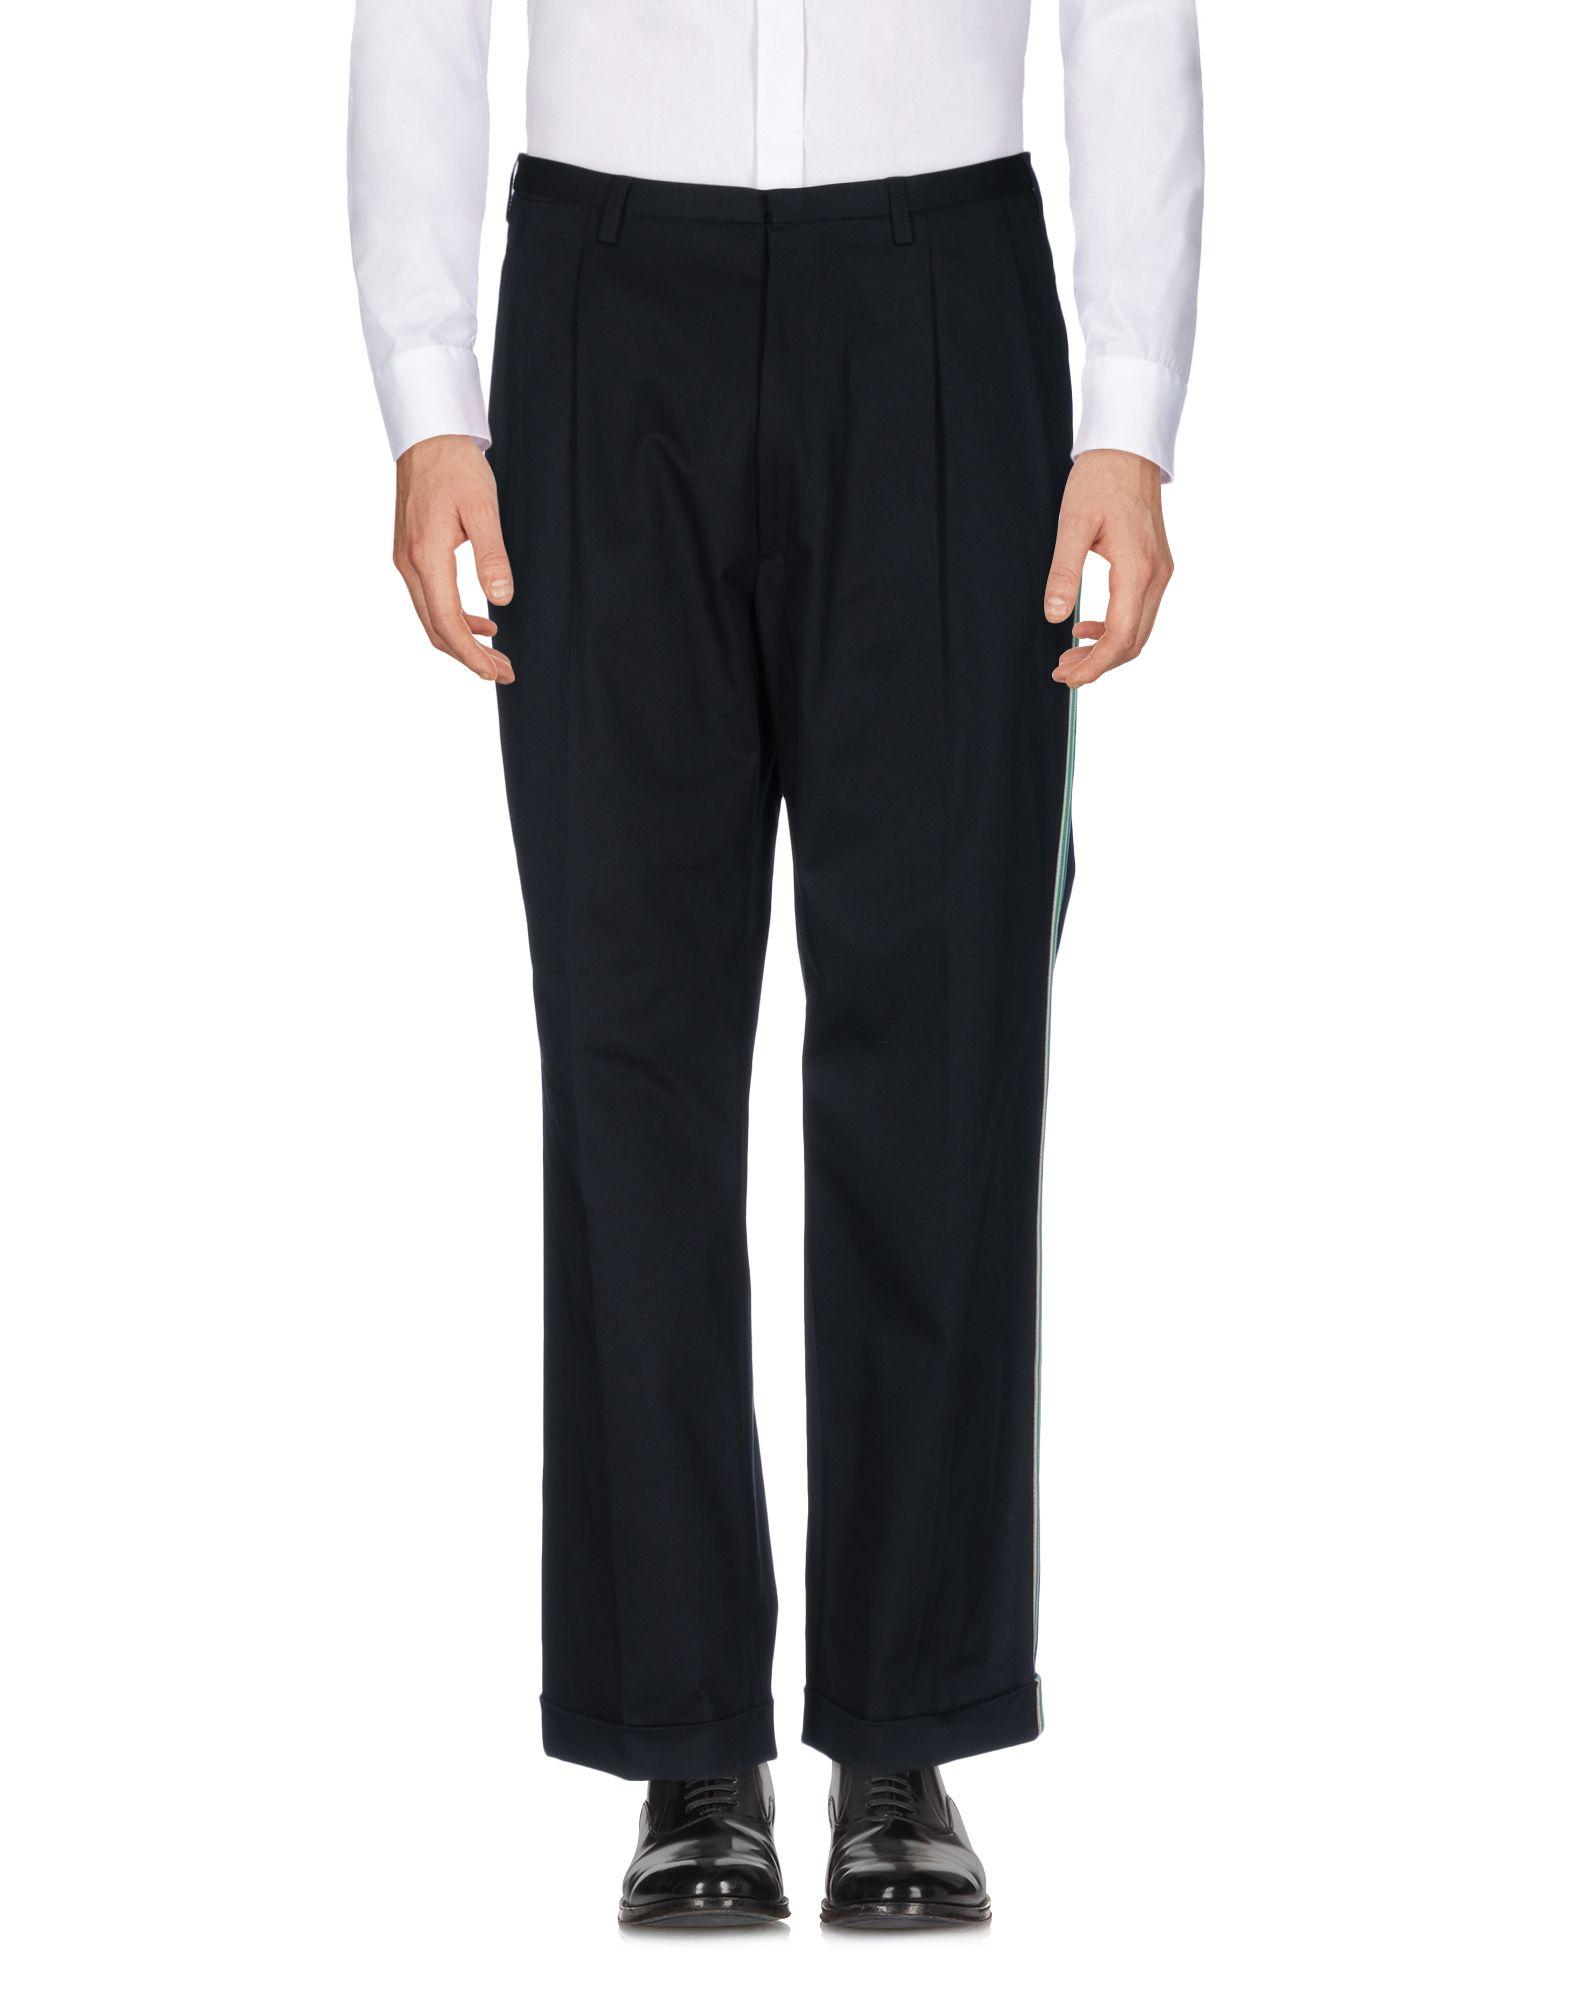 Pantalone Walter Van Beirendonck Uomo - Acquista online su